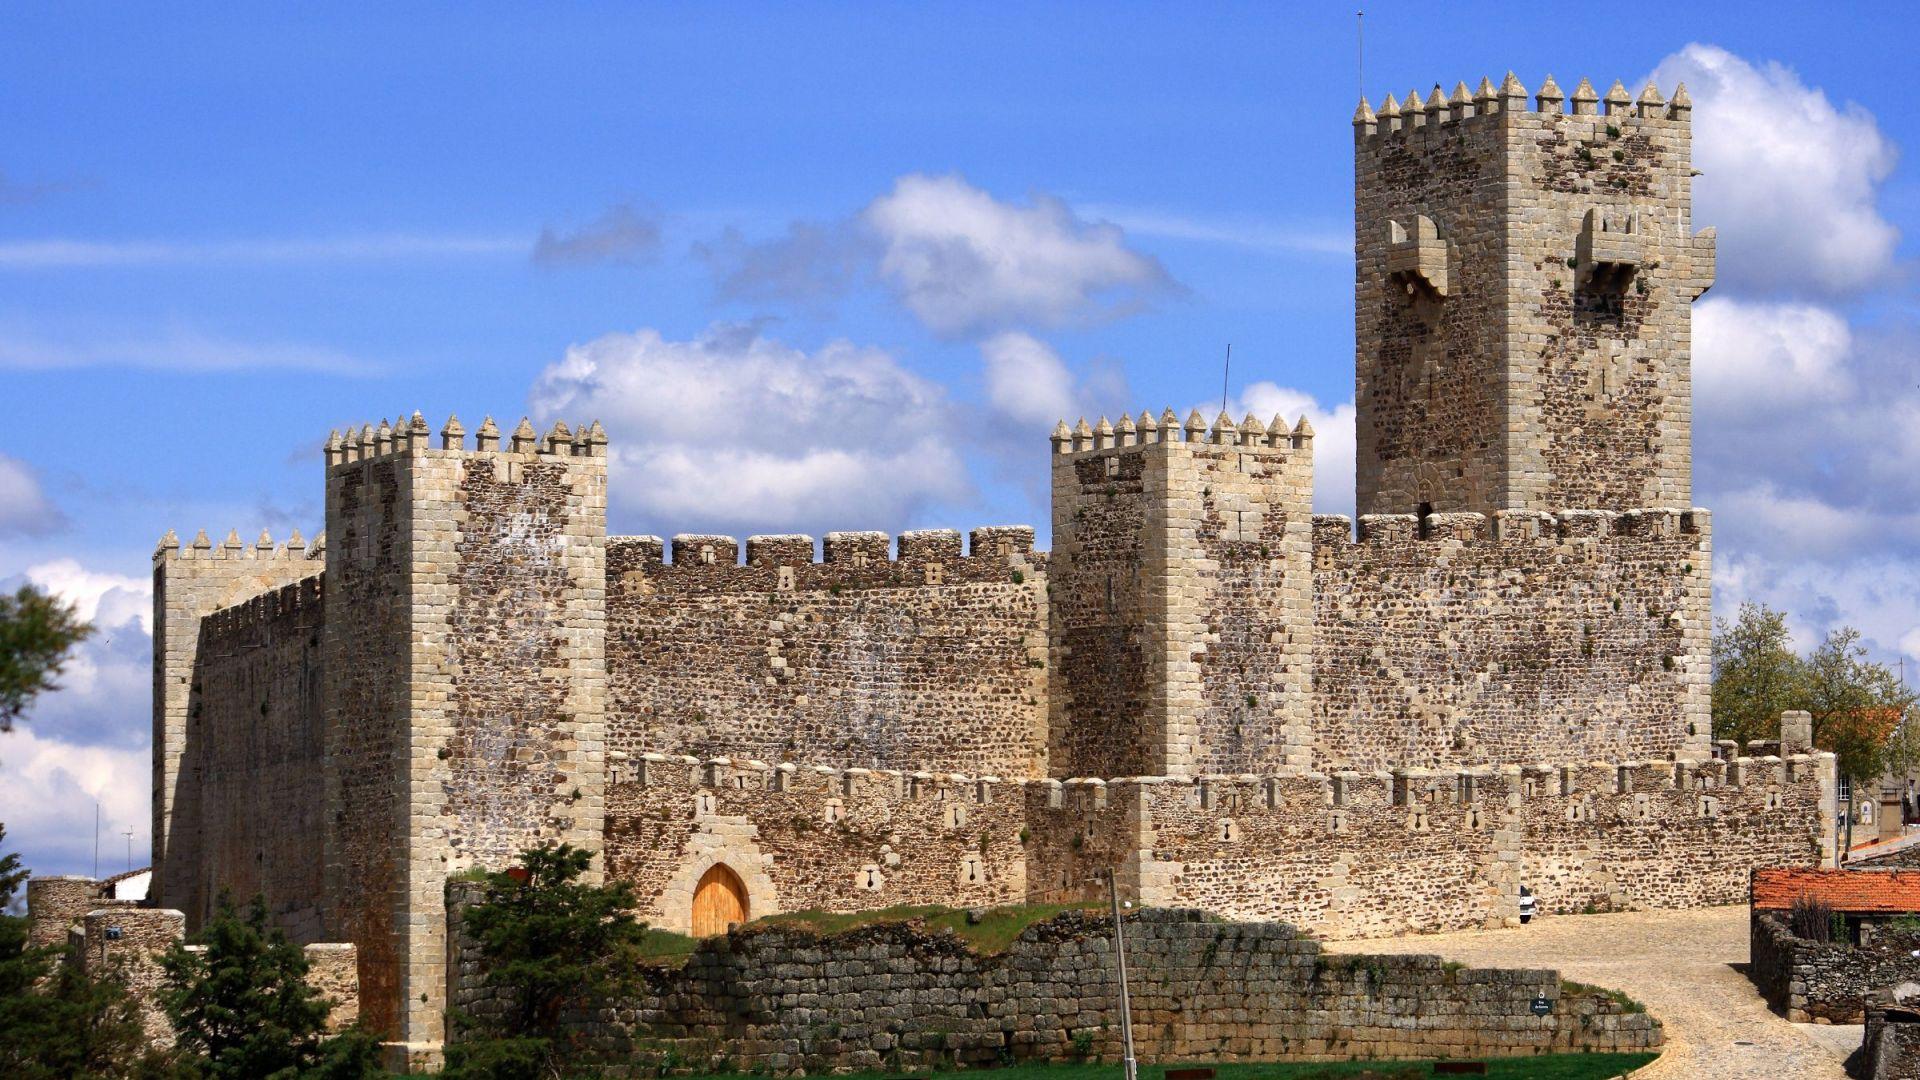 Het kasteel van Sabugal in Guarda